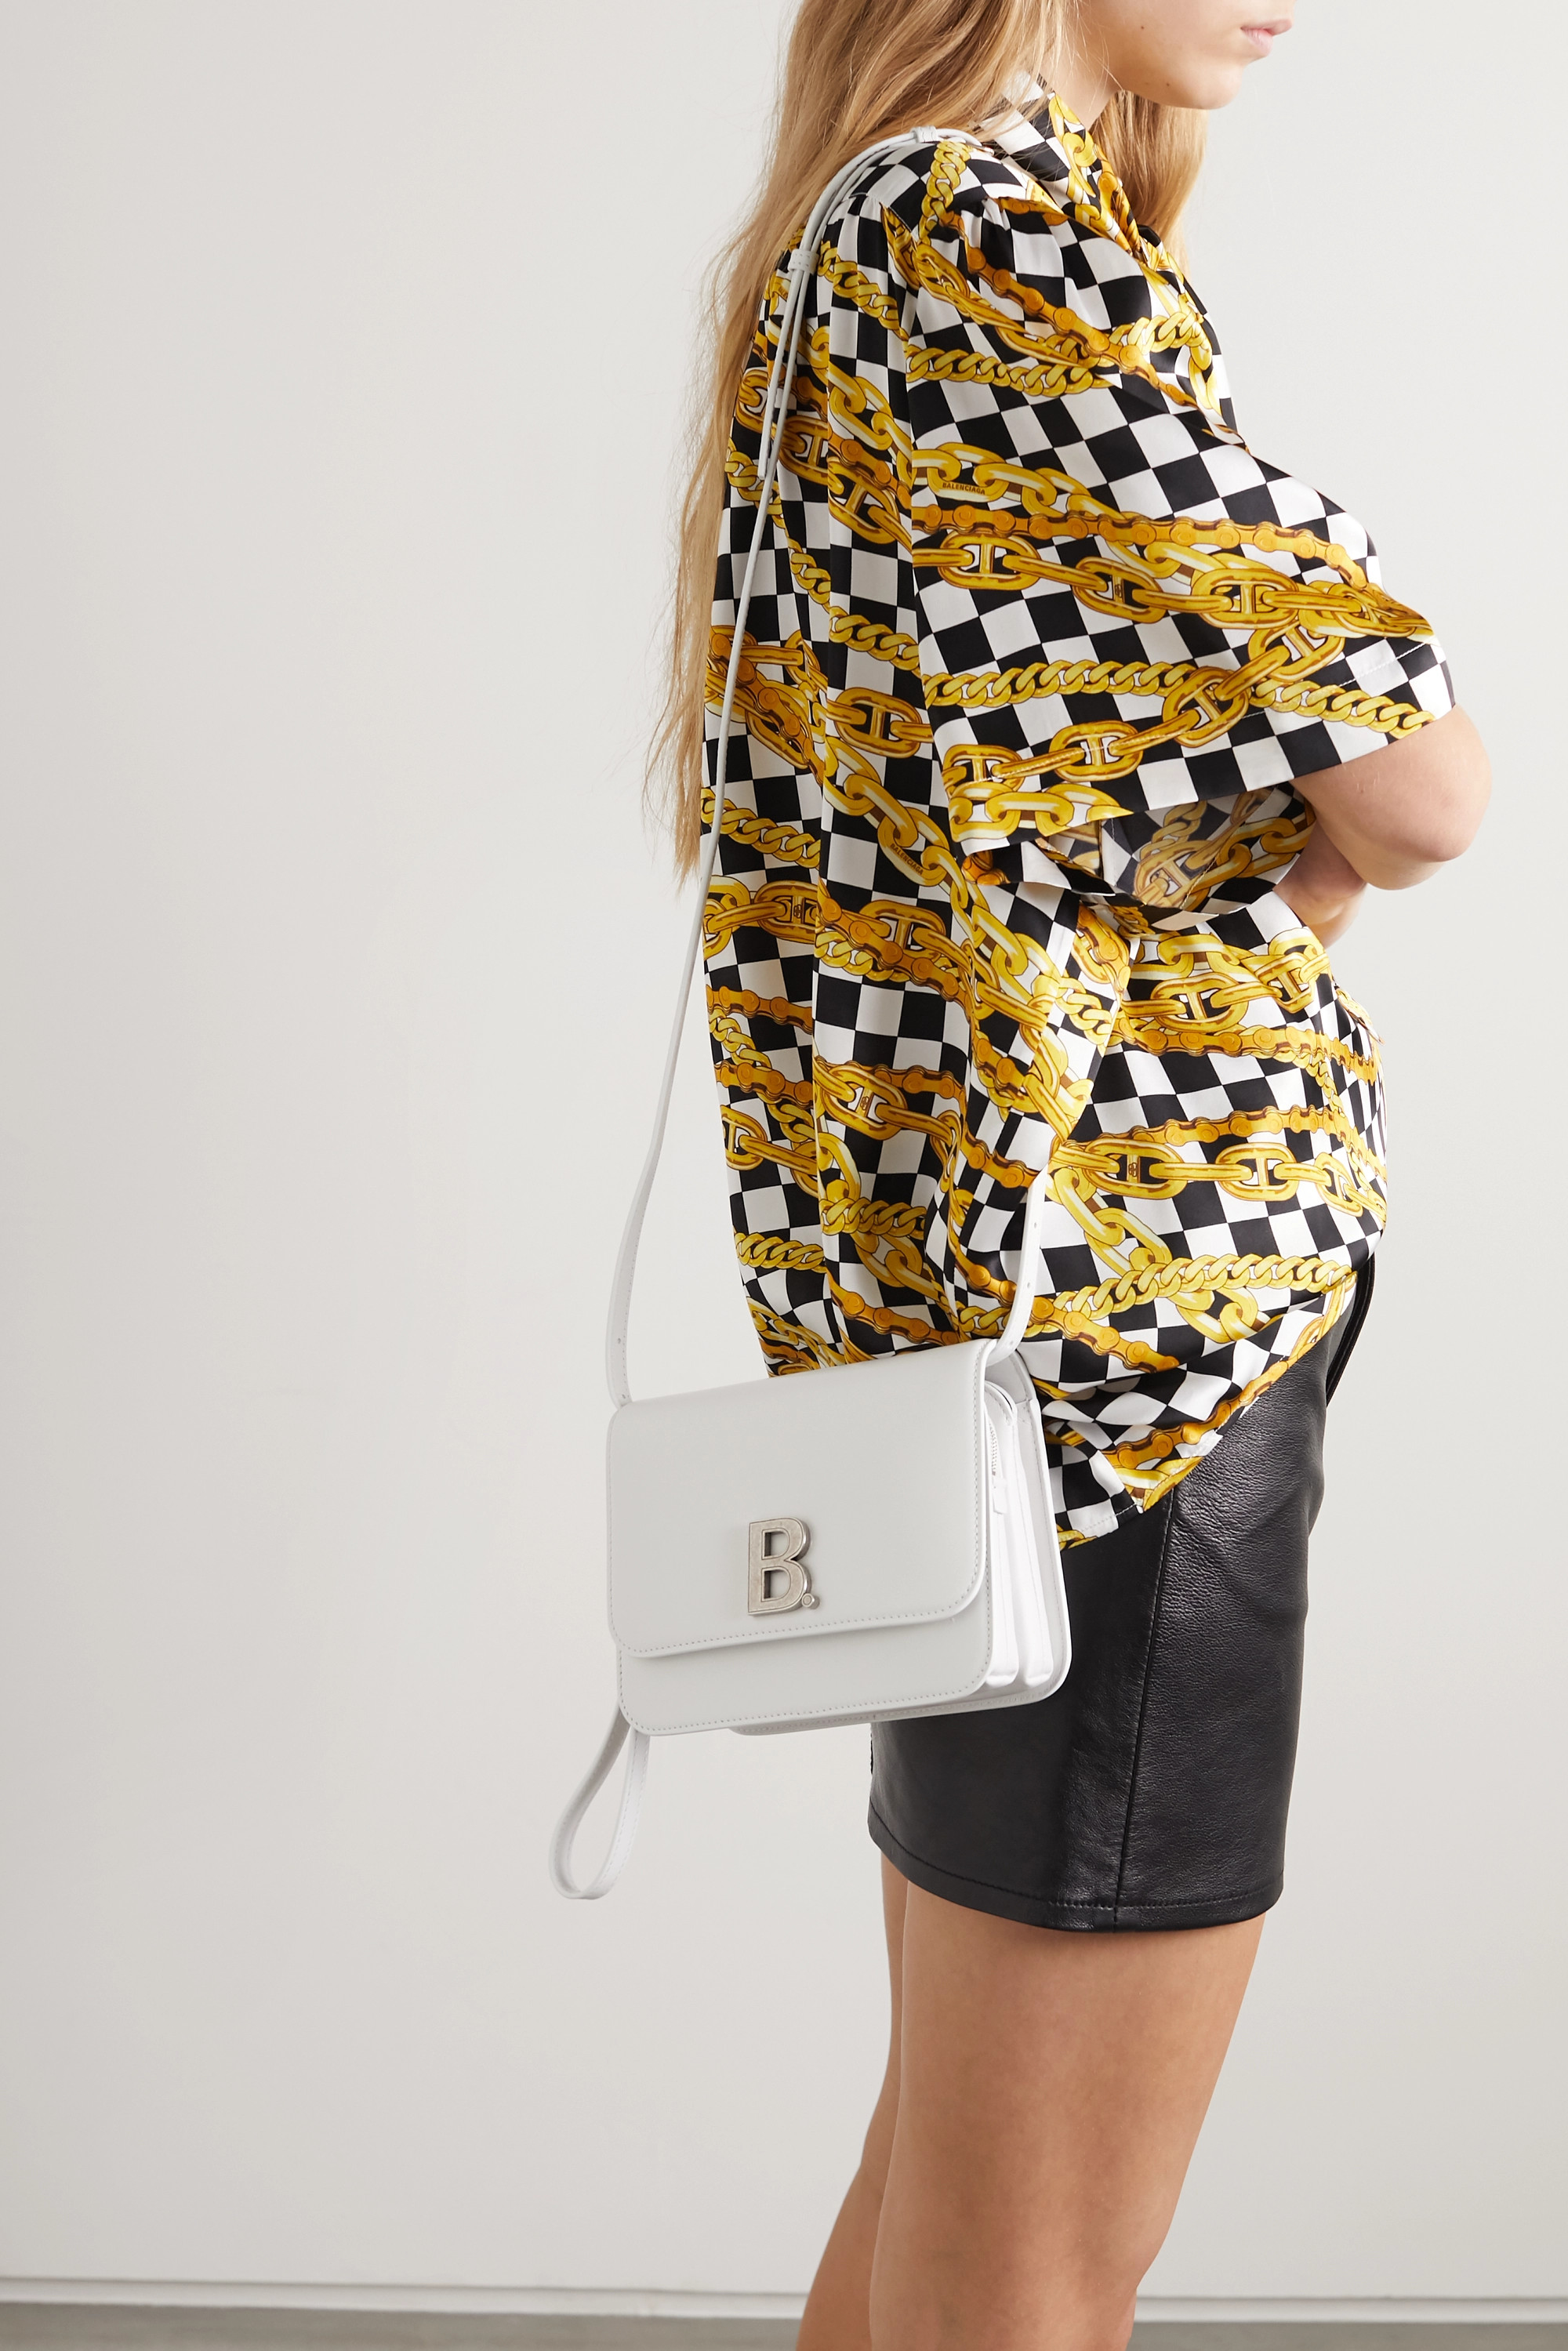 Balenciaga B Dot small leather shoulder bag